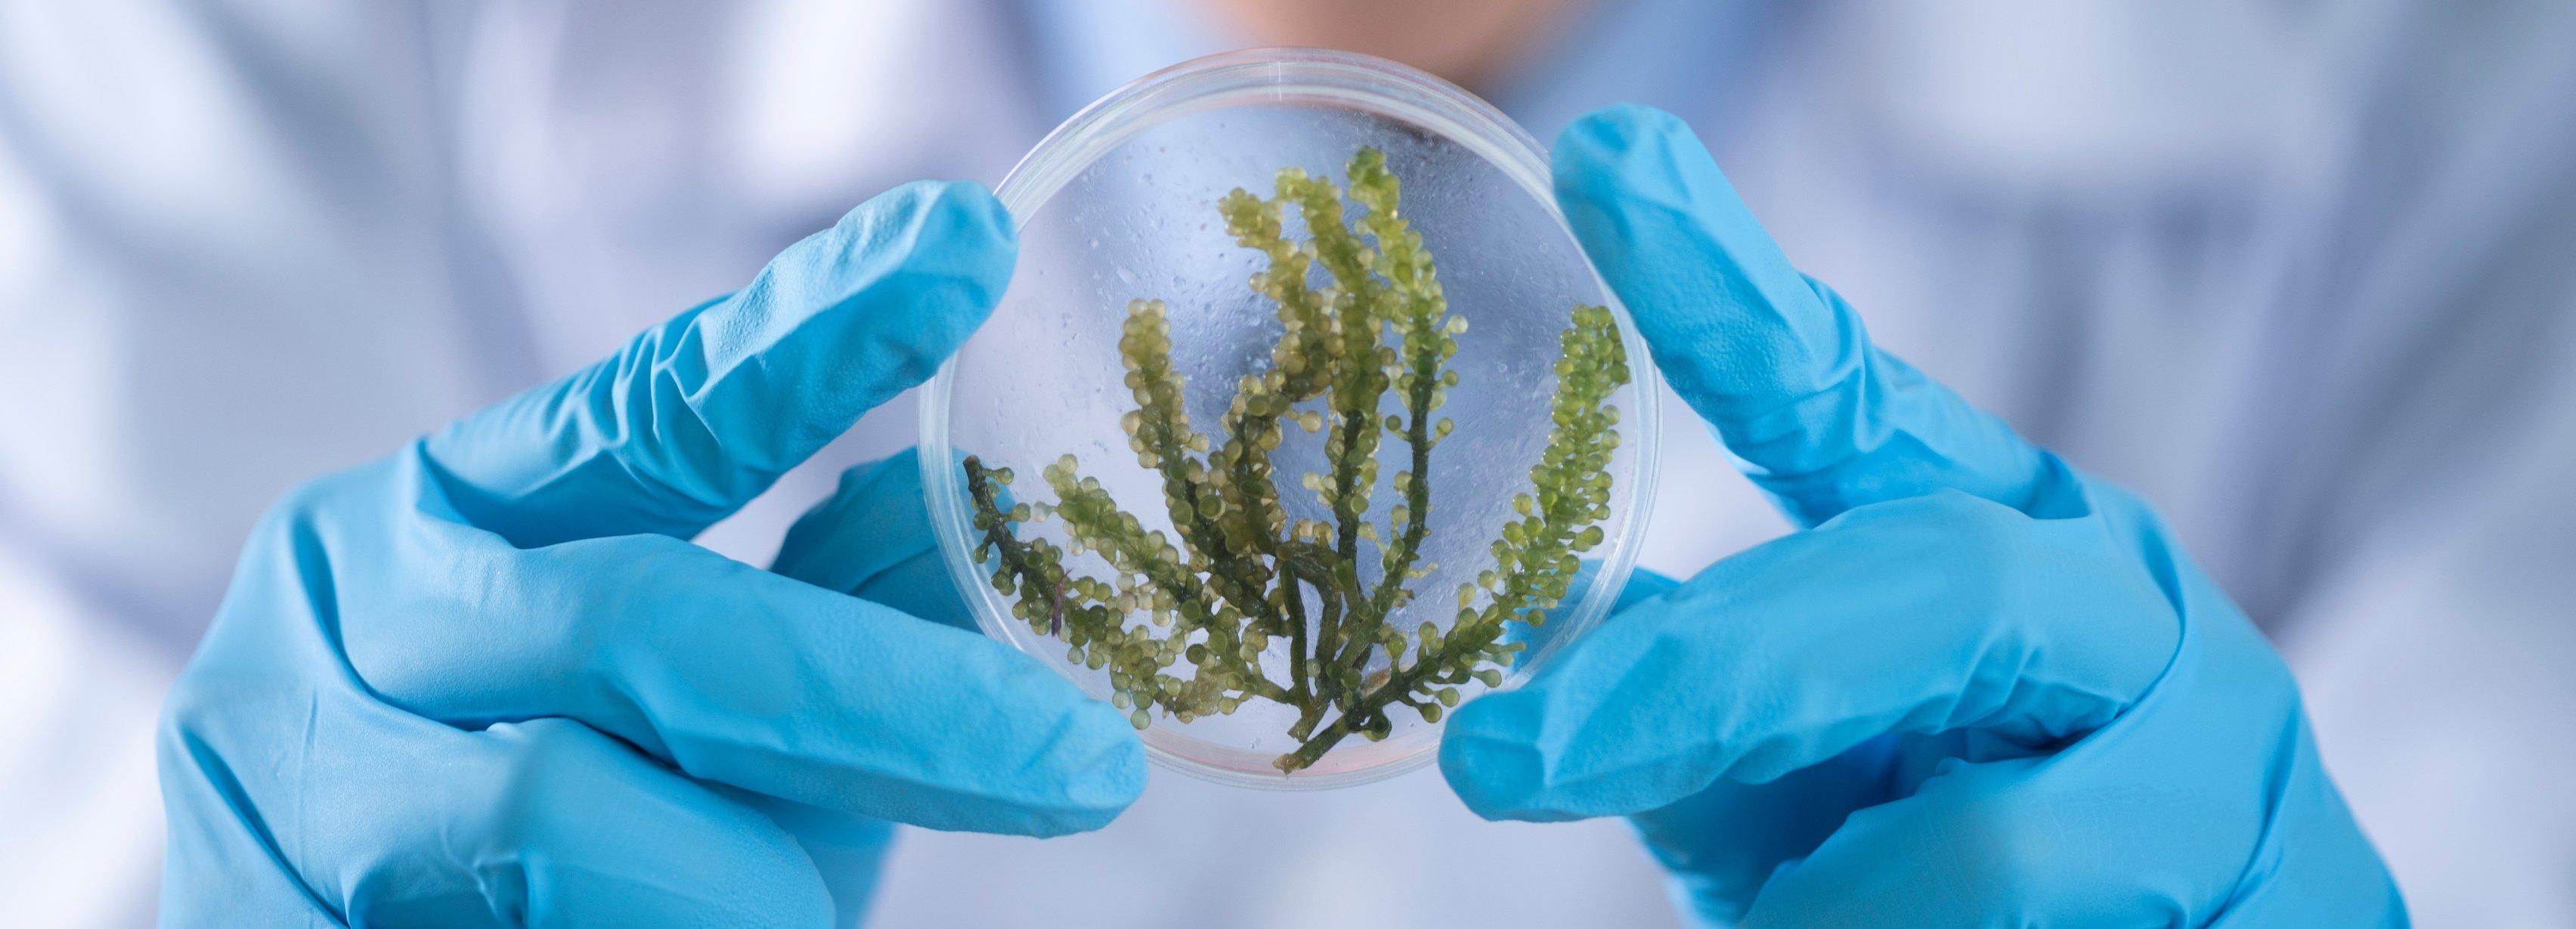 Therapure Biopharma case study